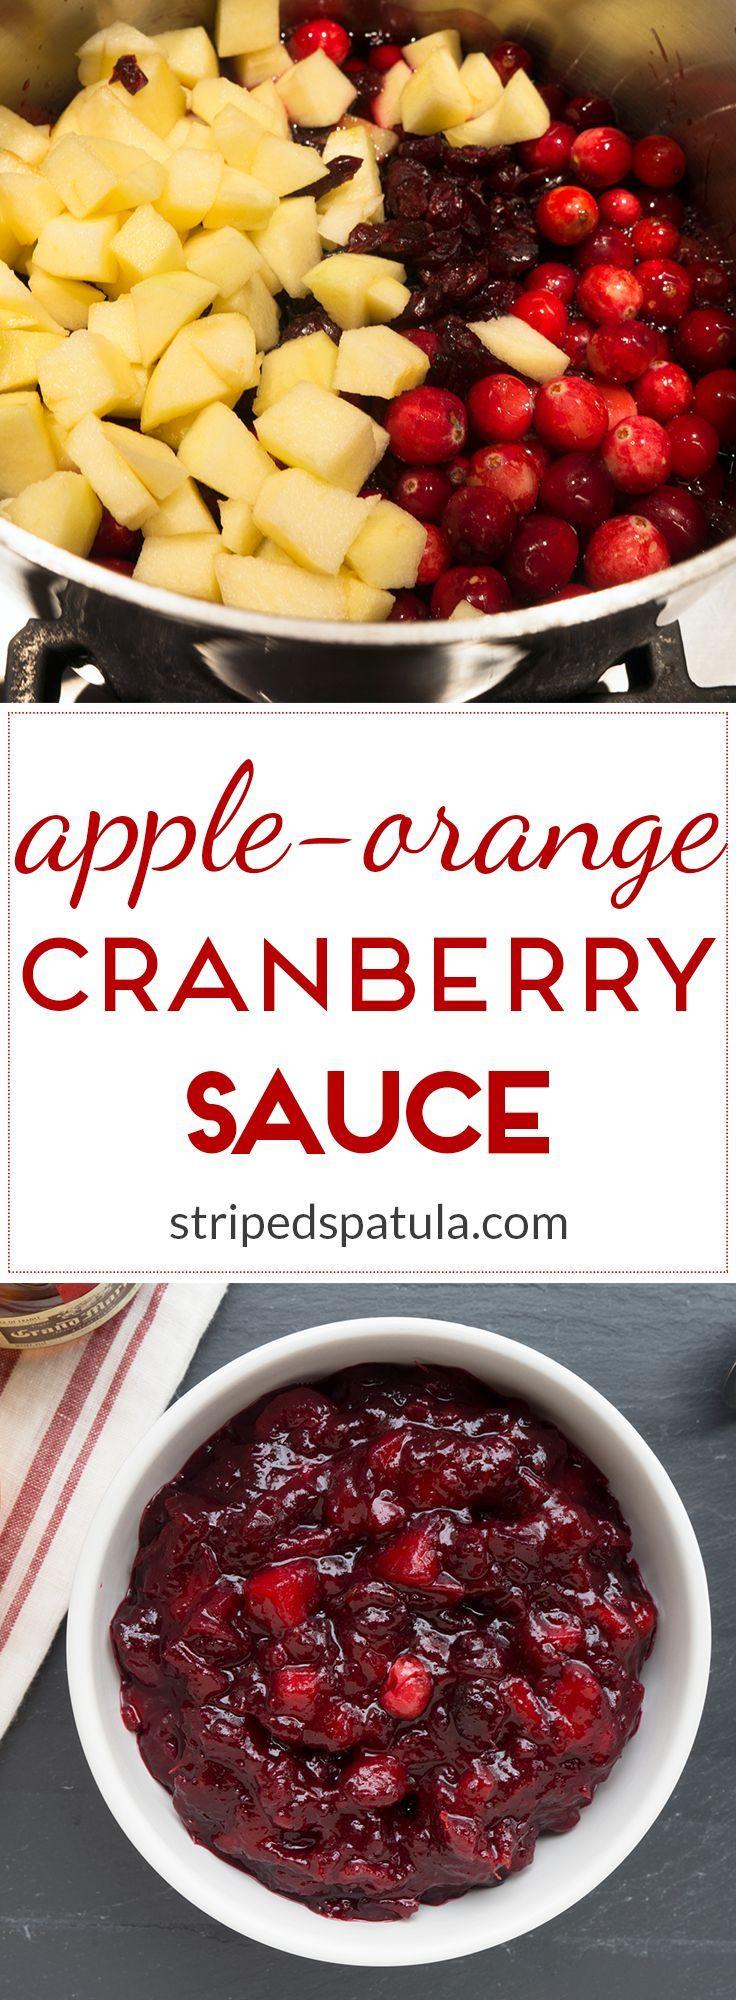 Cranberry Recipes For Thanksgiving  Apple Orange Cranberry Sauce Recipe